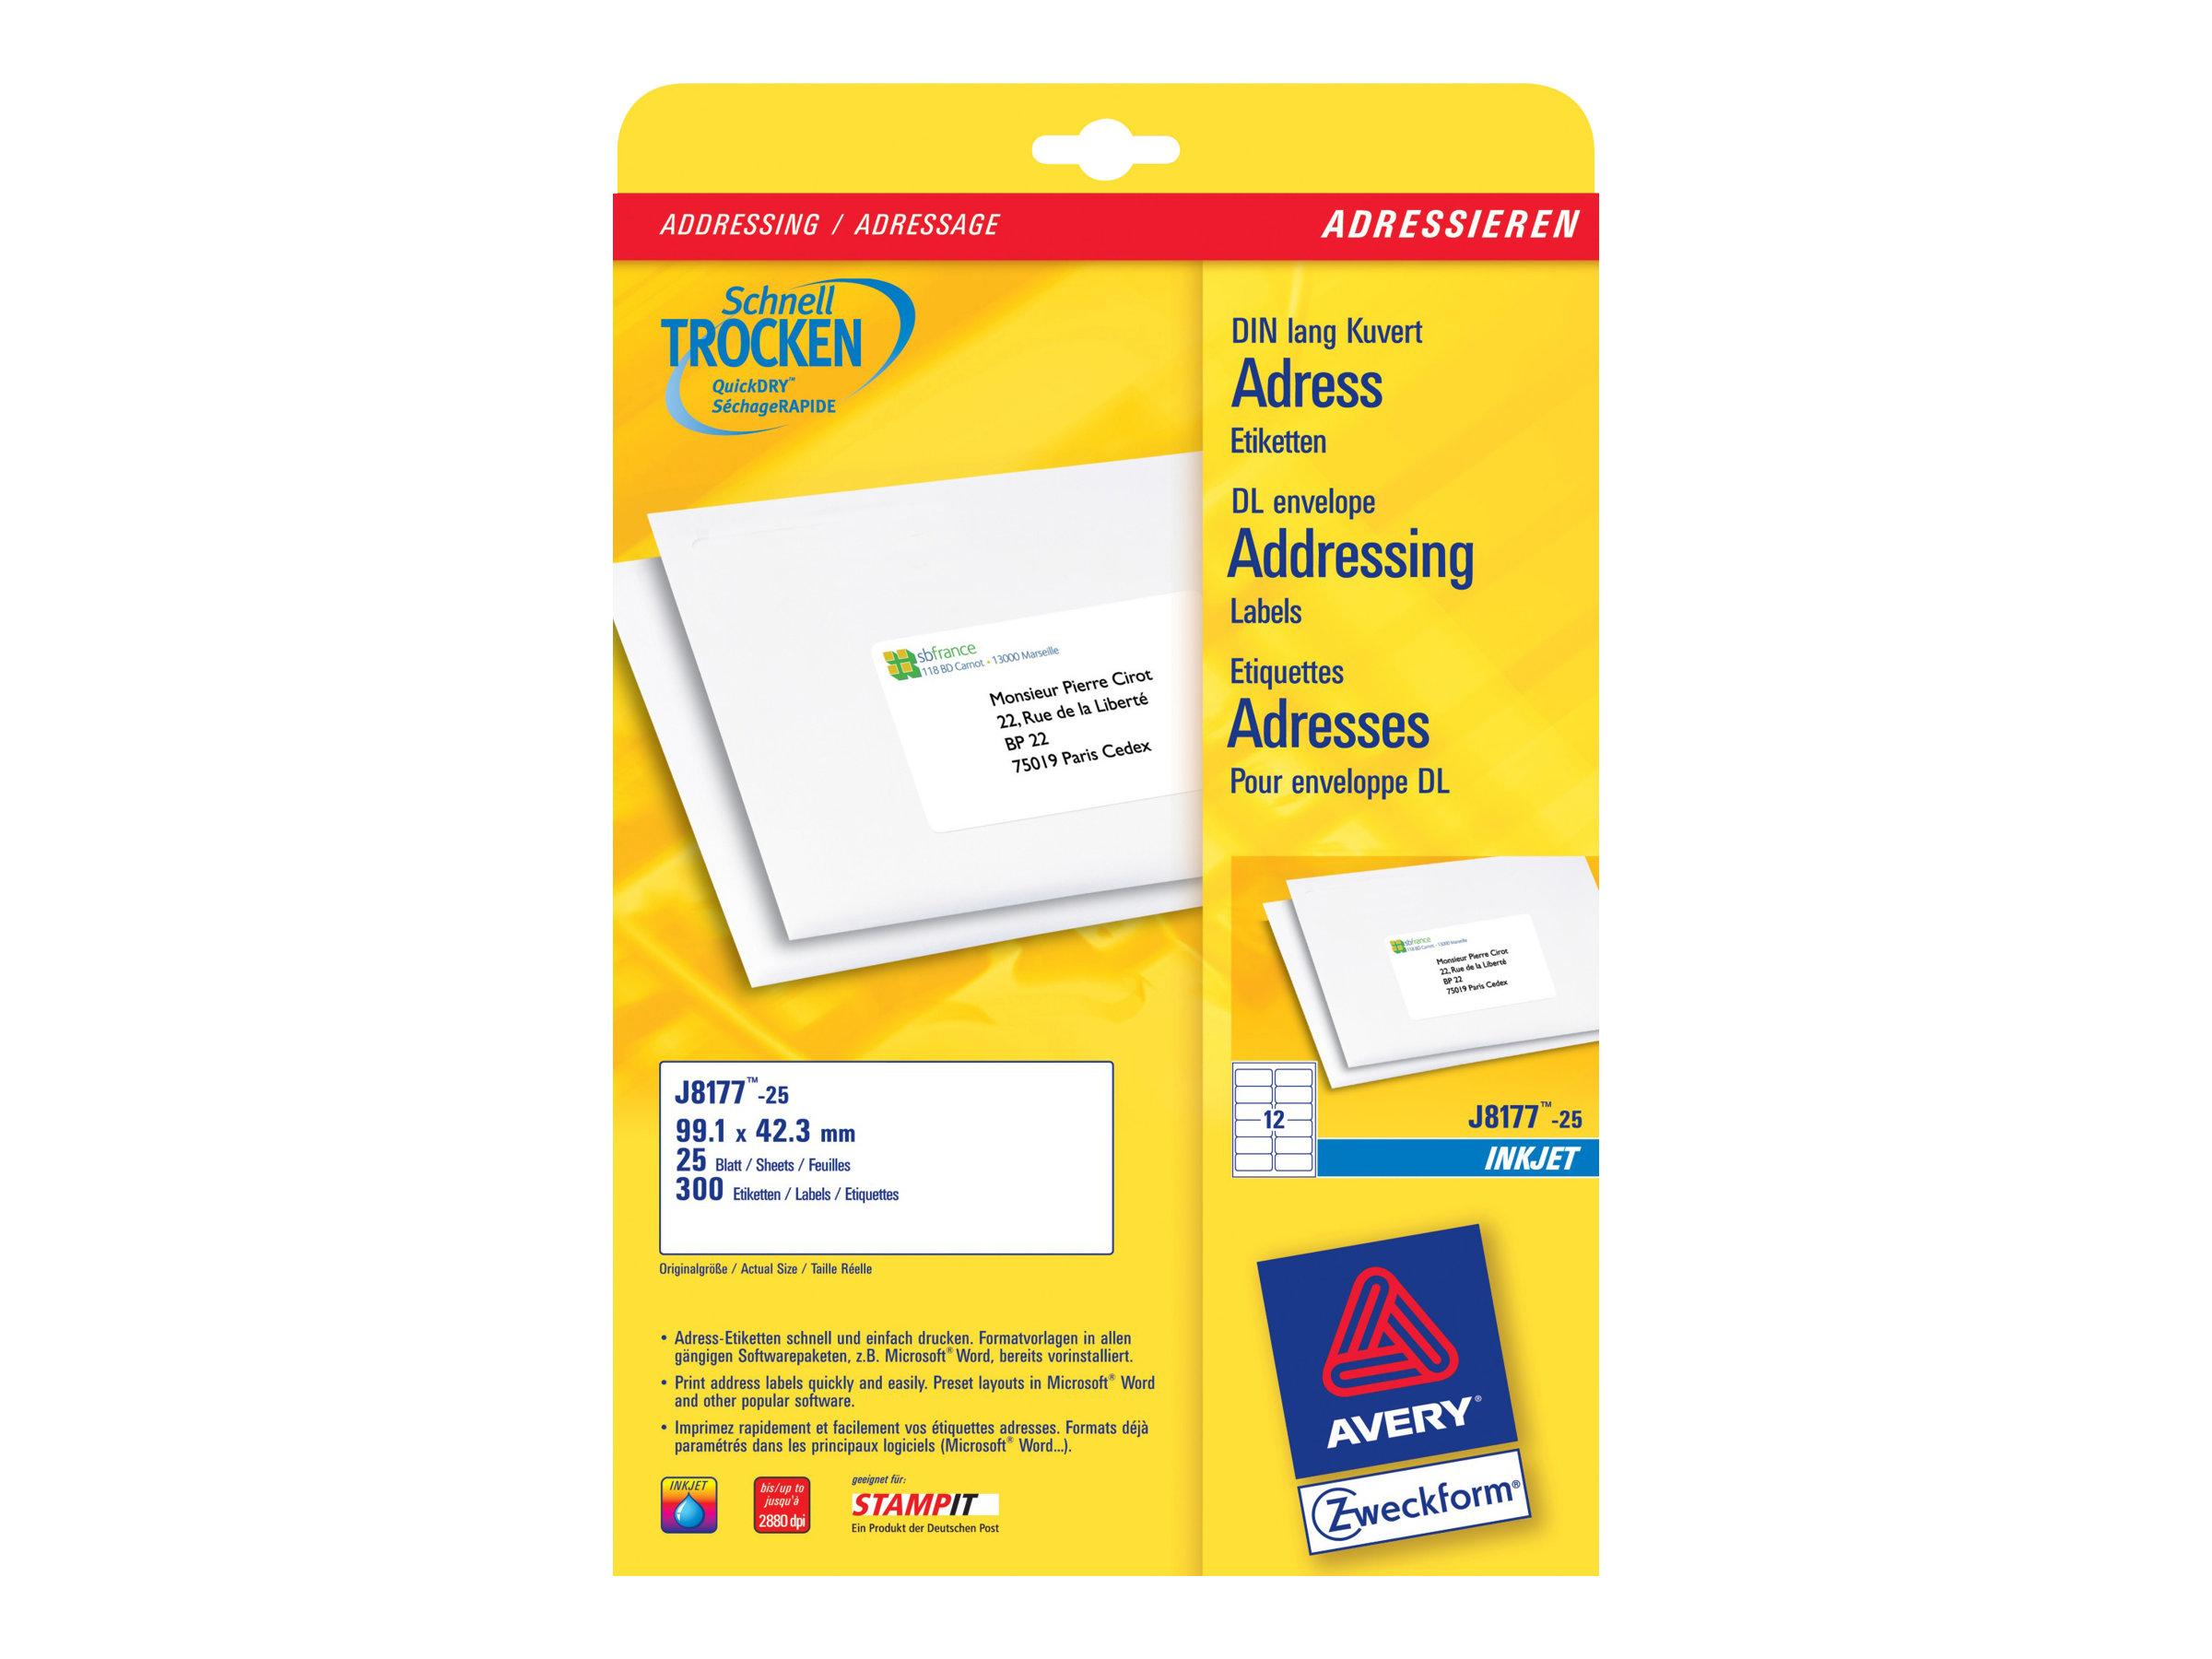 Avery Zweckform J8177 - Weiß - 42.3 x 99.1 mm 300 Etikett(en) (25 Bogen x 12) Adressetiketten